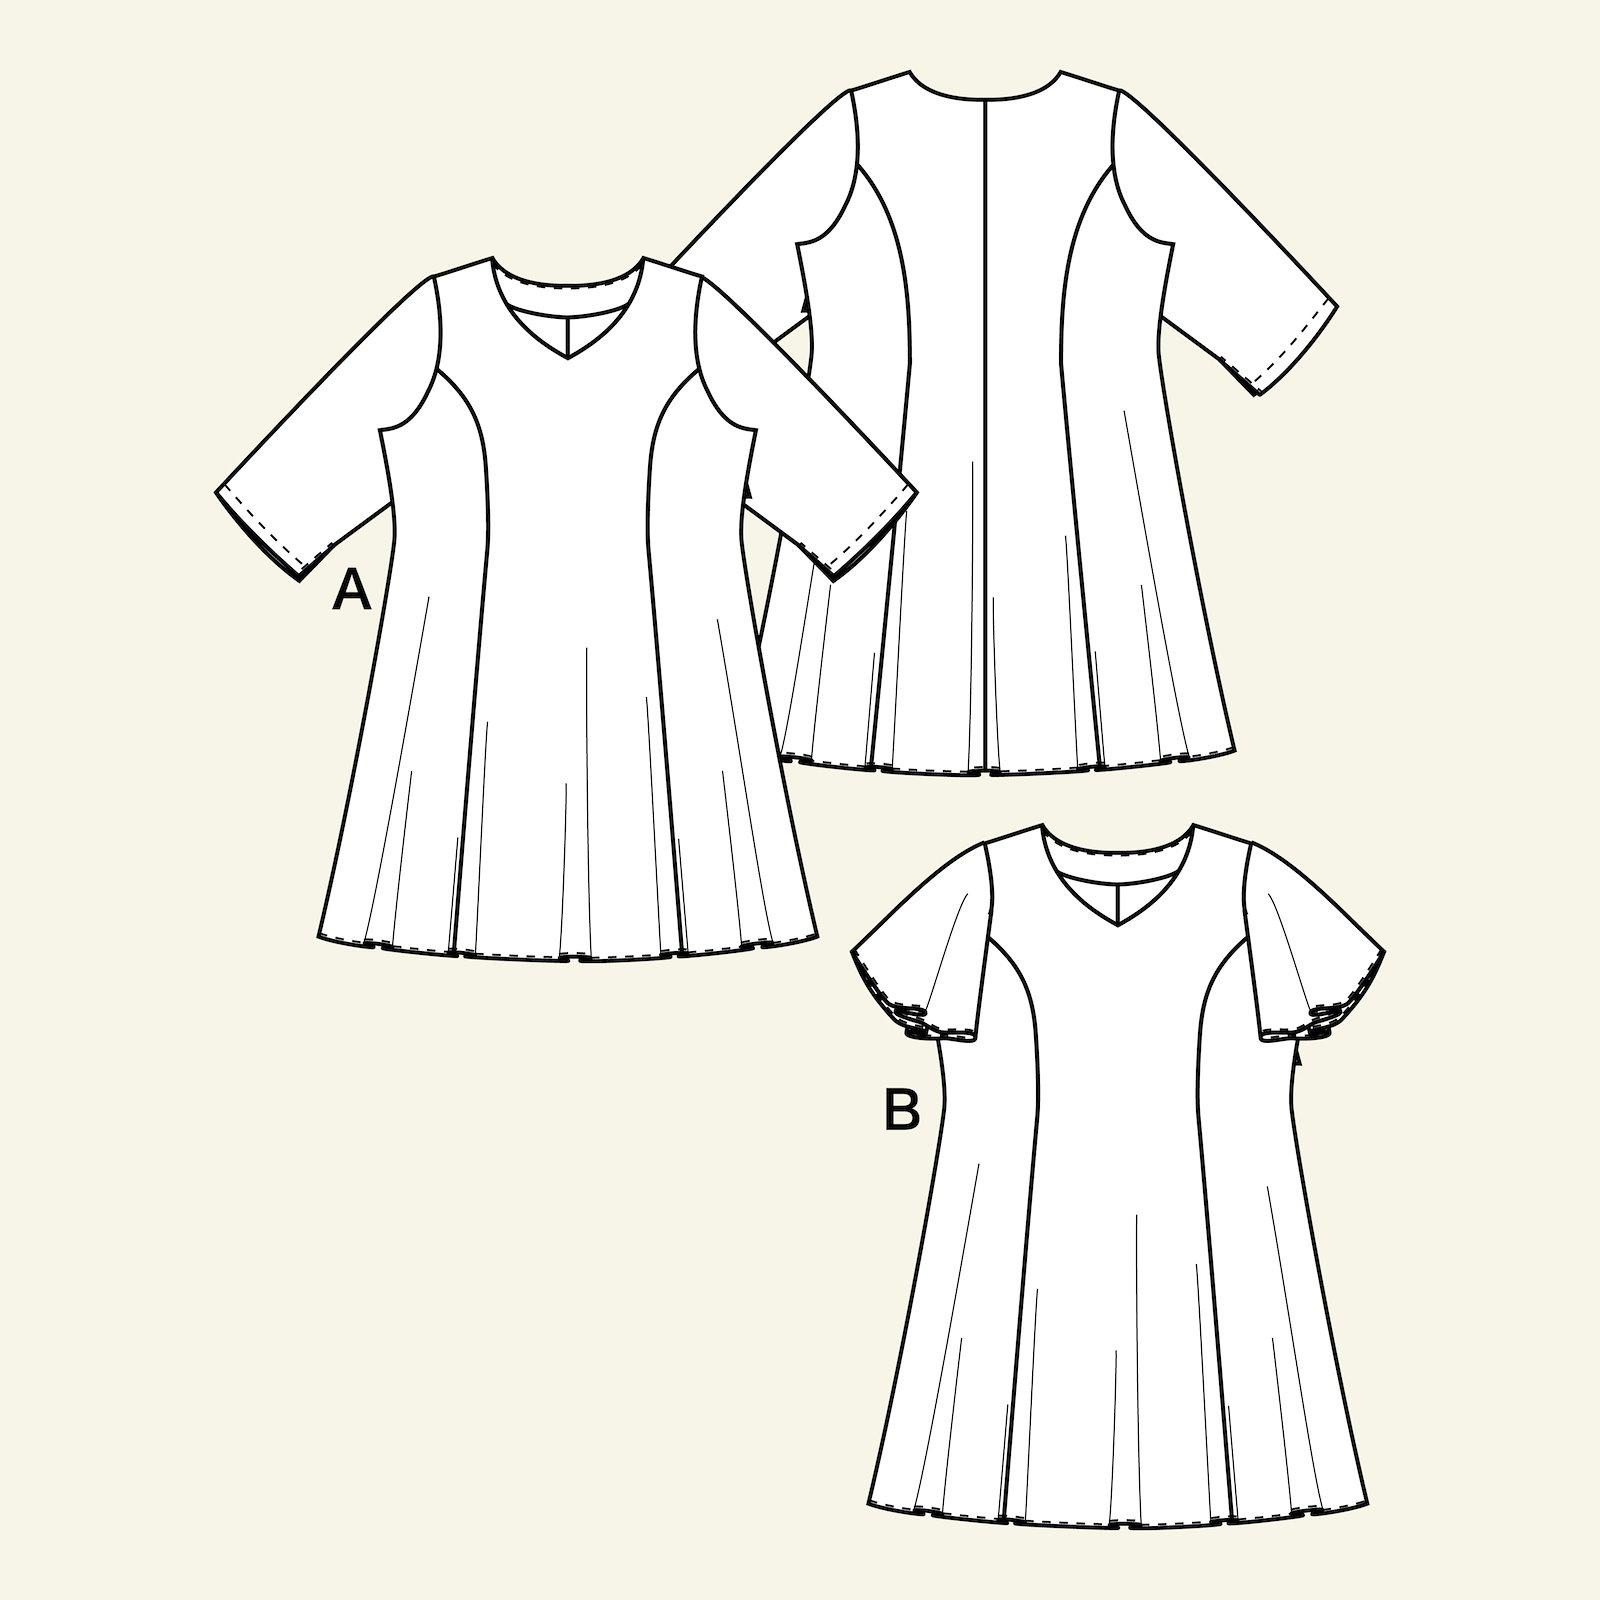 Dress with a princess cut, 52/24 p73016_pack